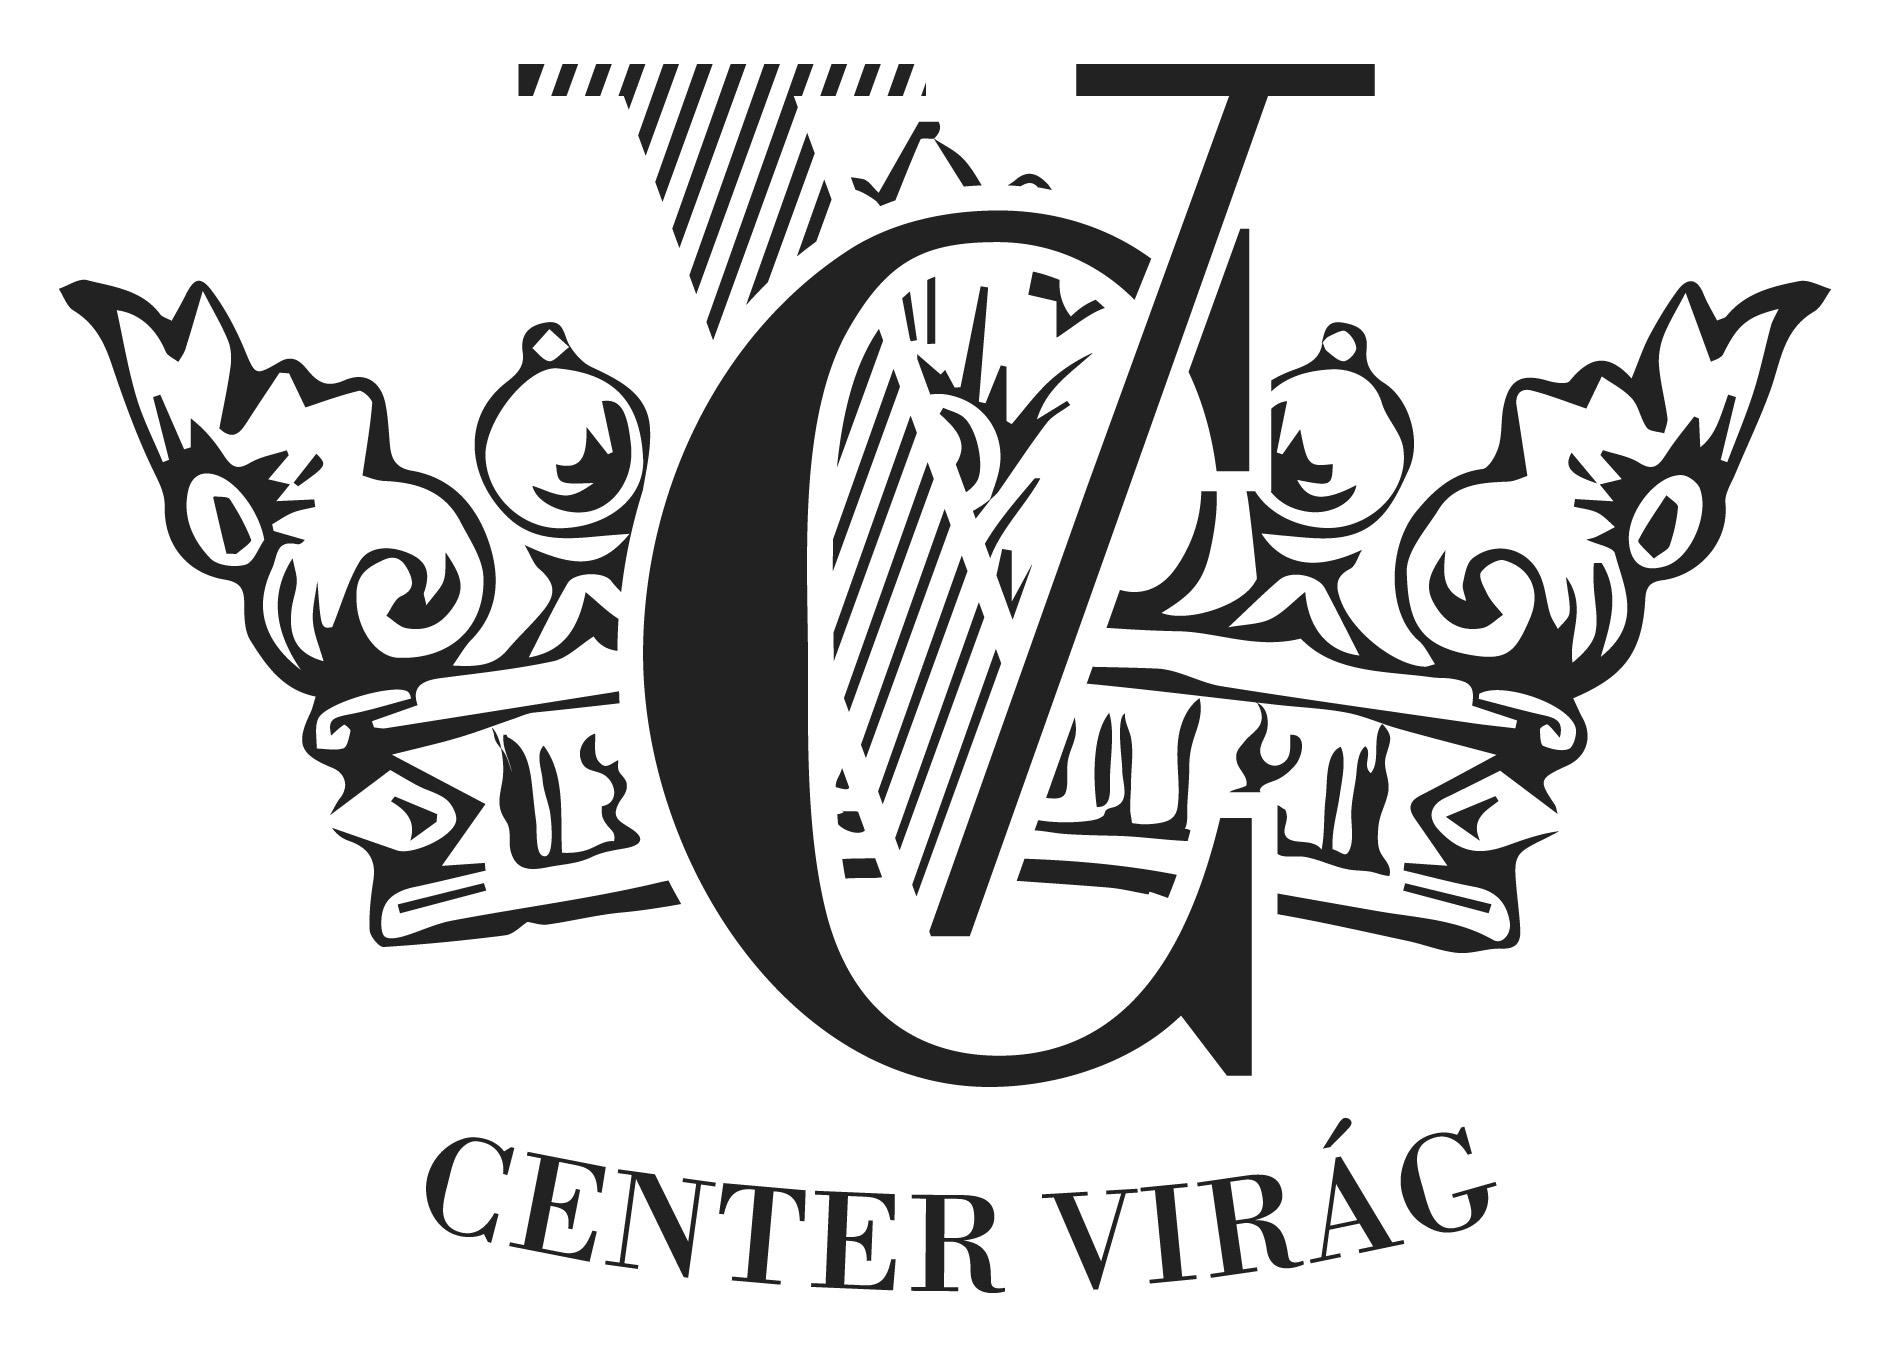 centervirag